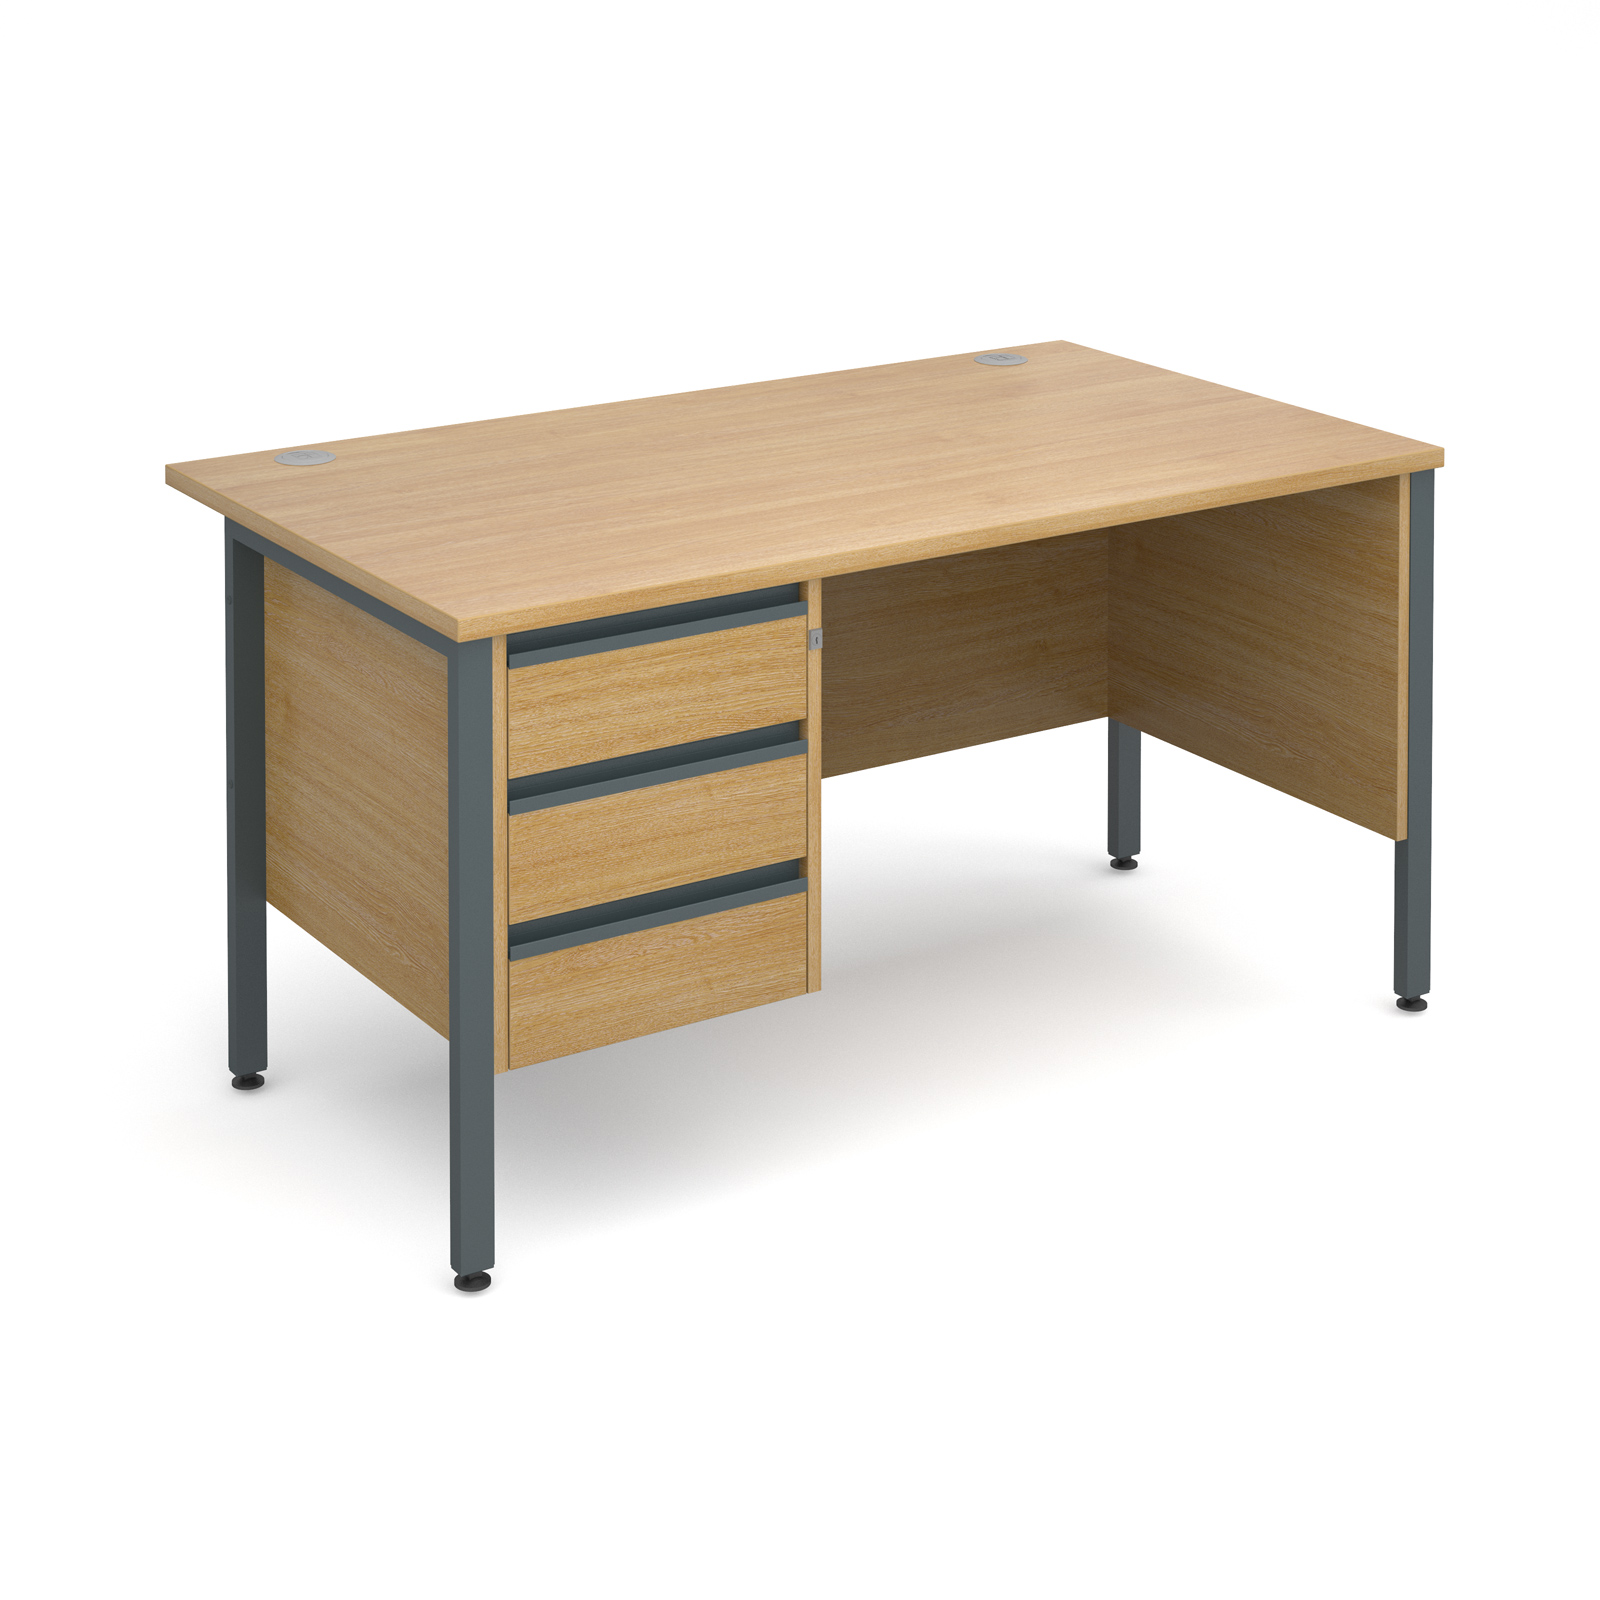 Maestro 25 Gl Straight Desk With 3 Drawer Pedestal 1400mm Graphite H Frame Oak Top